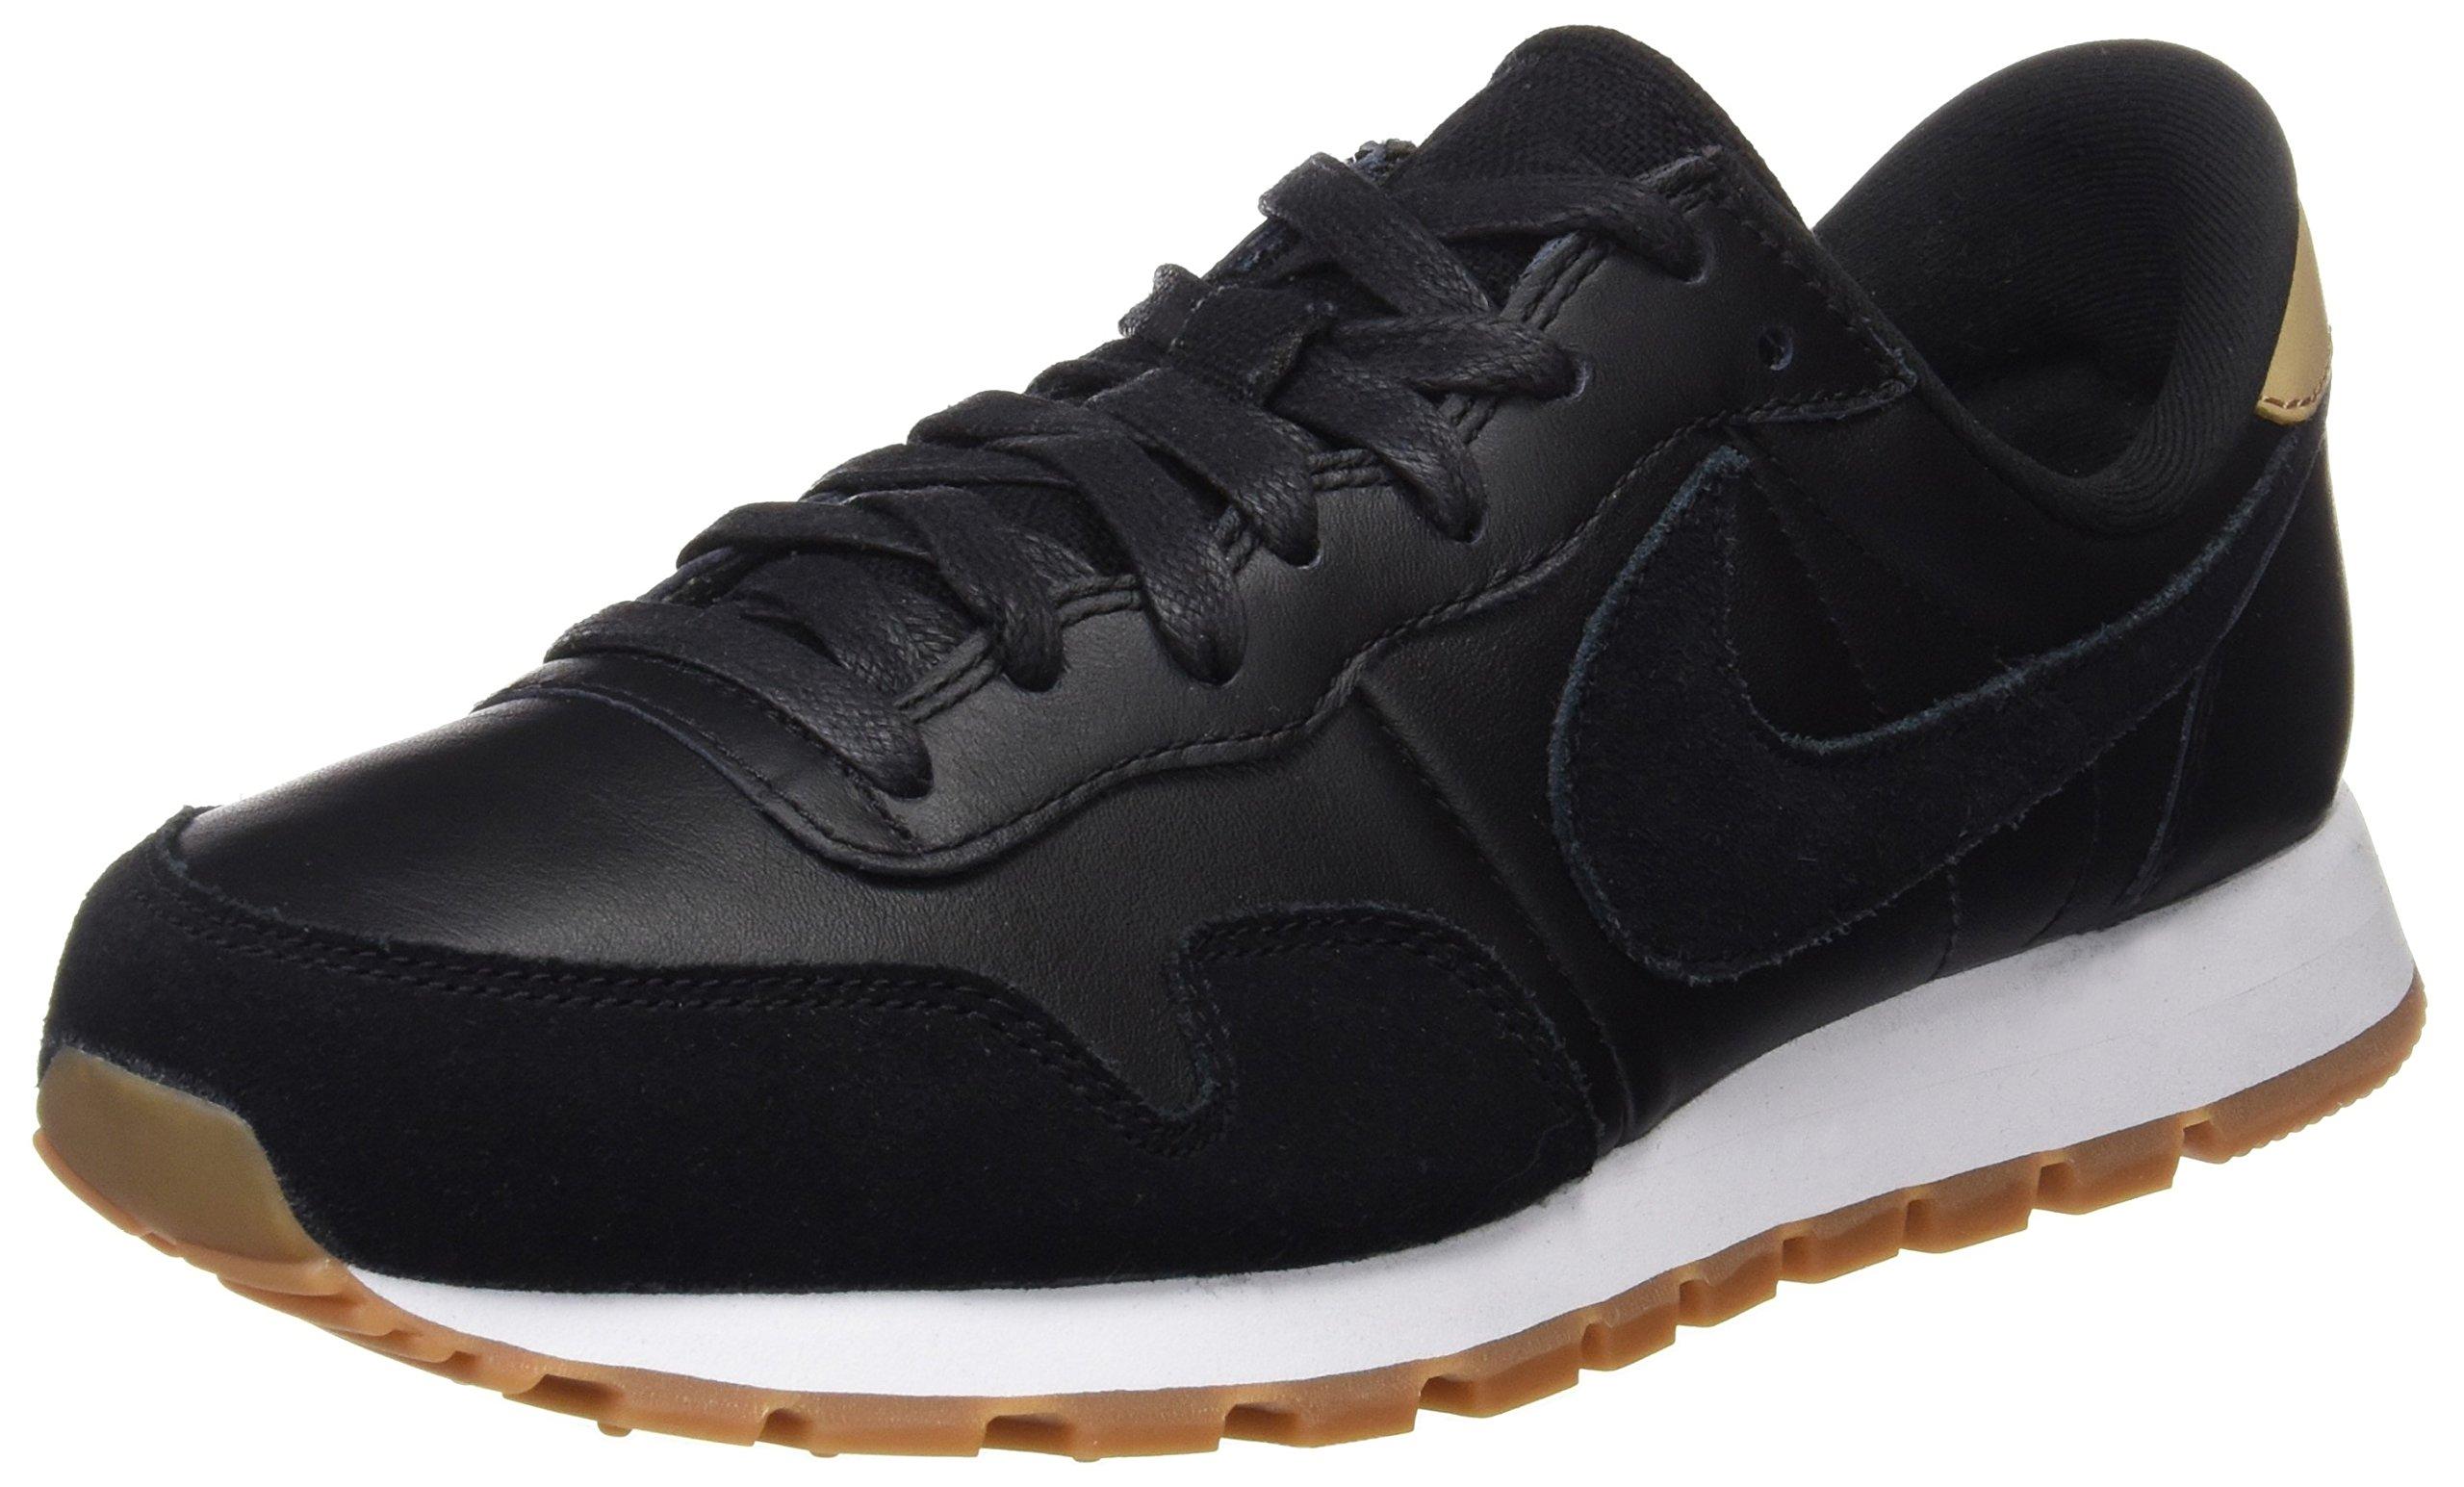 Nike HommeMulticolorenegro septiembre42 Basses 844752Baskets Eu lFJuTc35K1